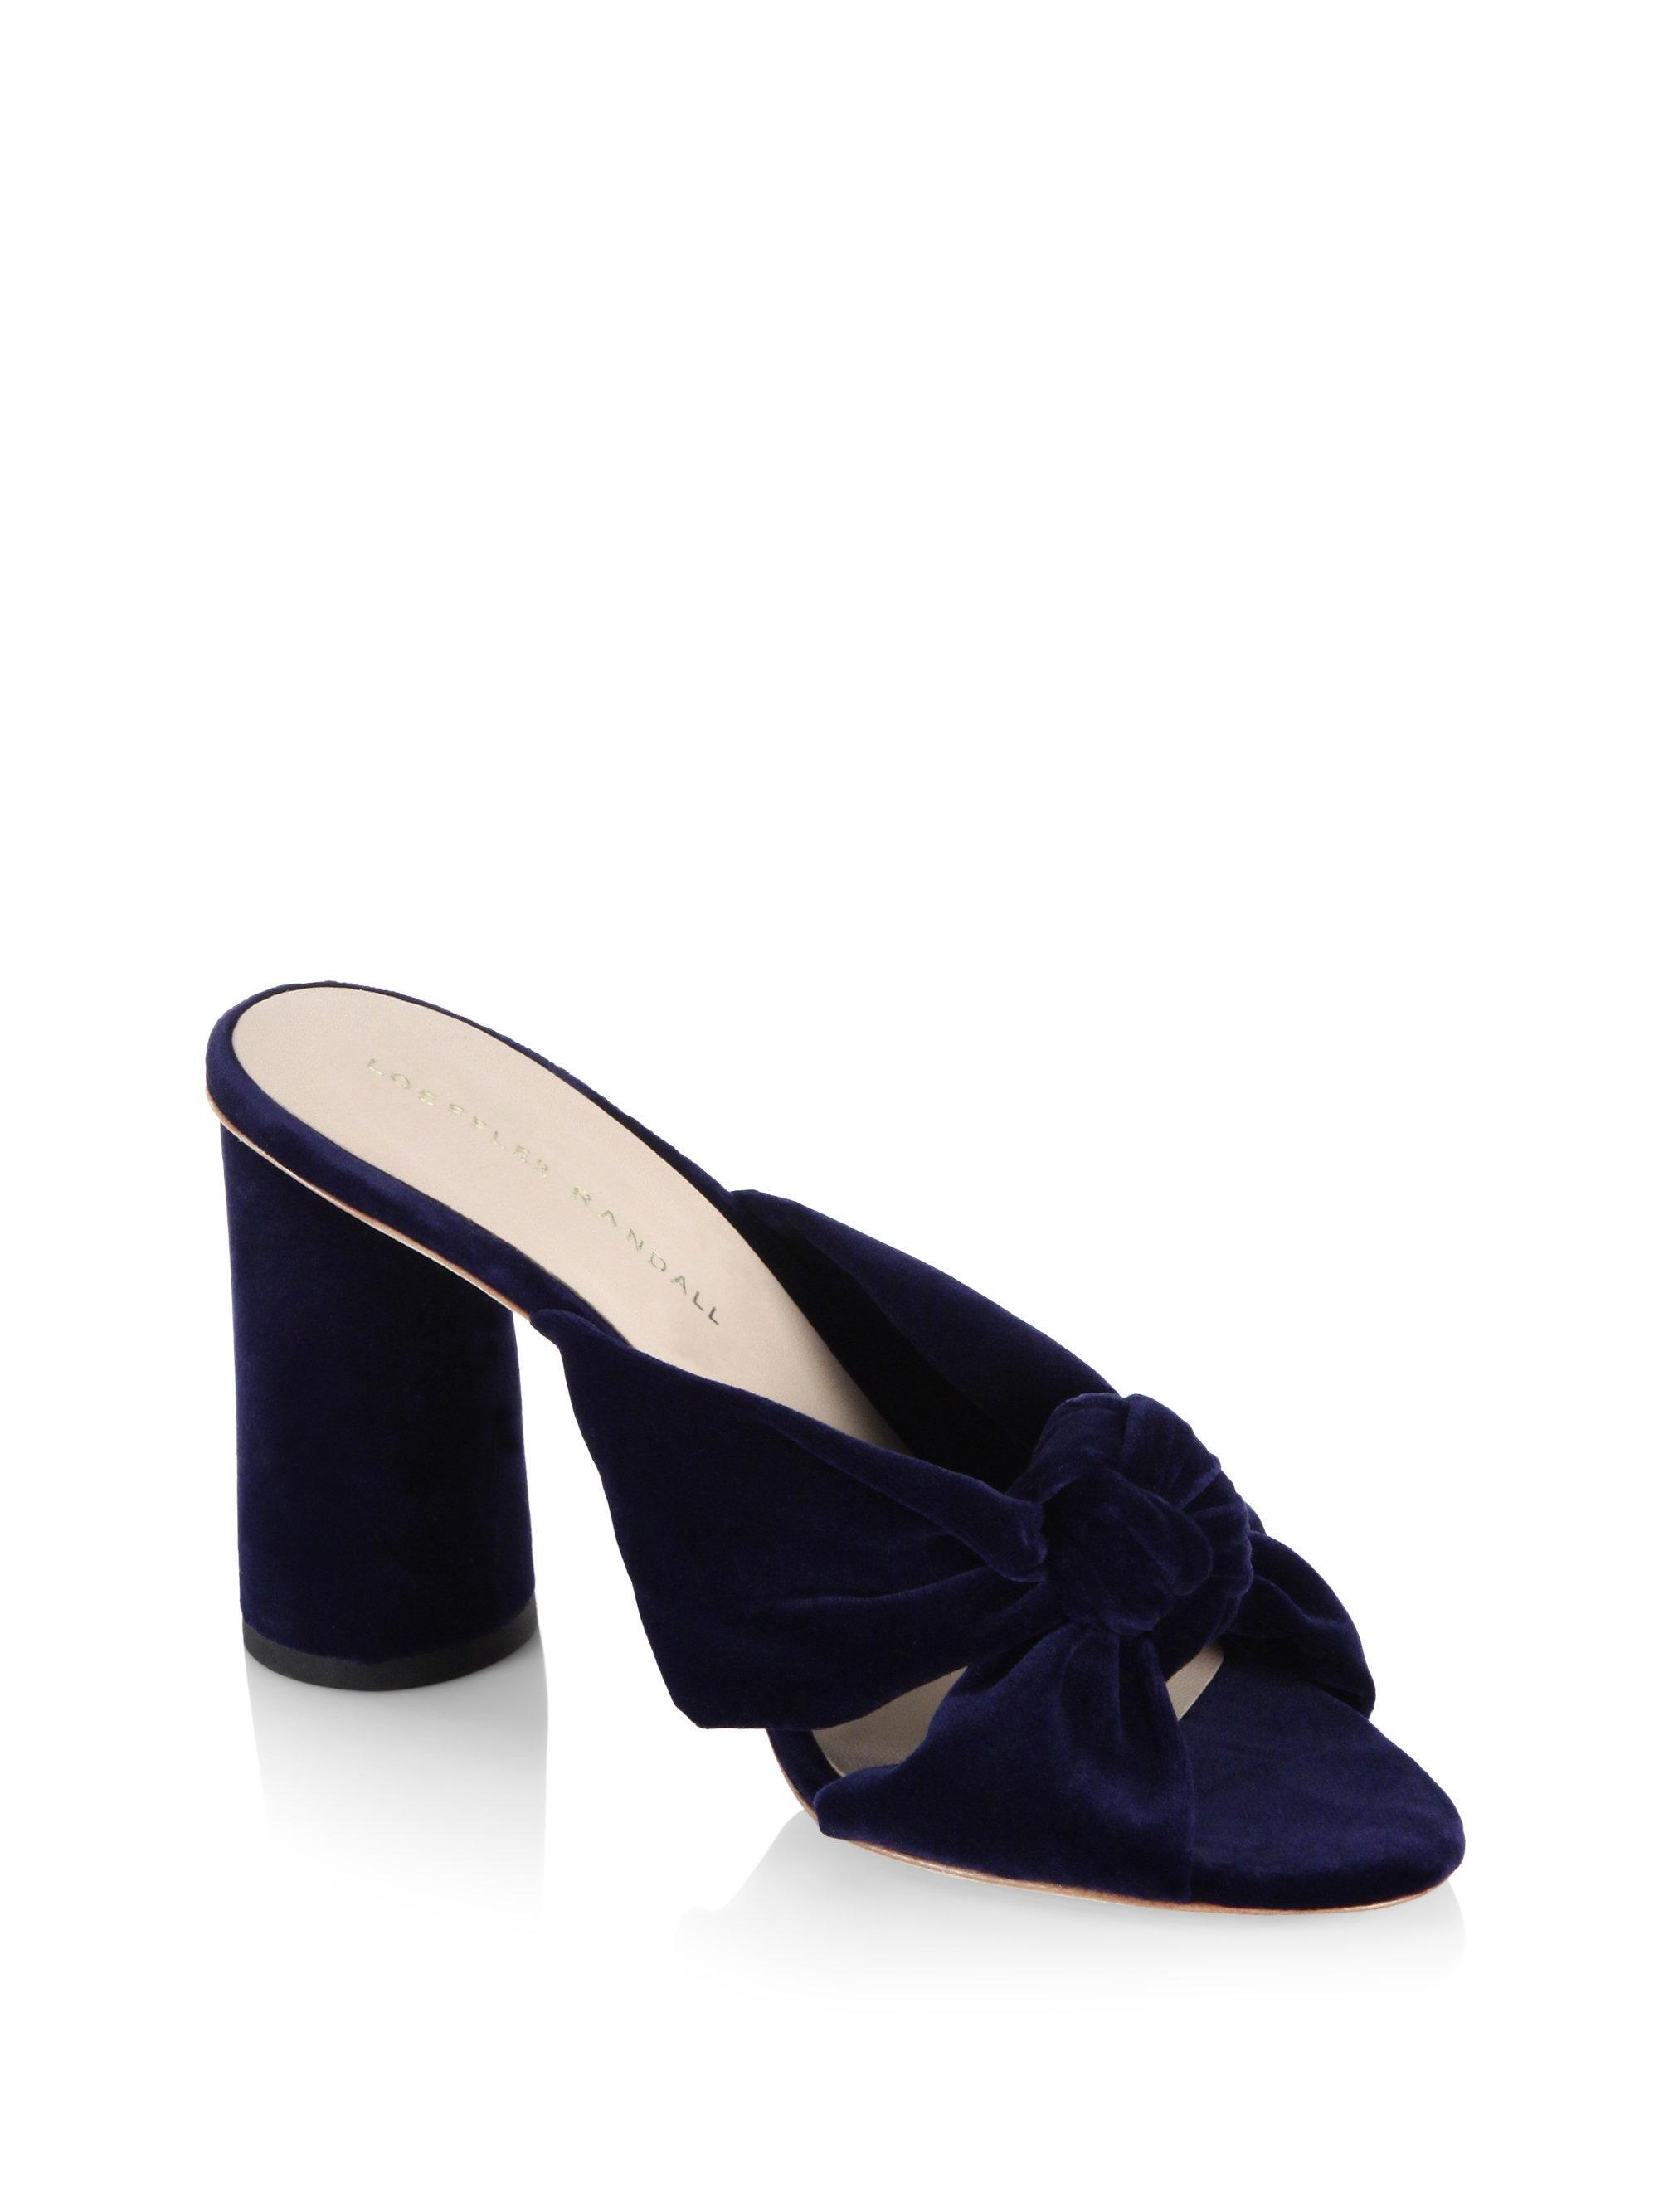 cc62f2e177c Women's Blue Coco Knotted Velvet Block Heel Mules